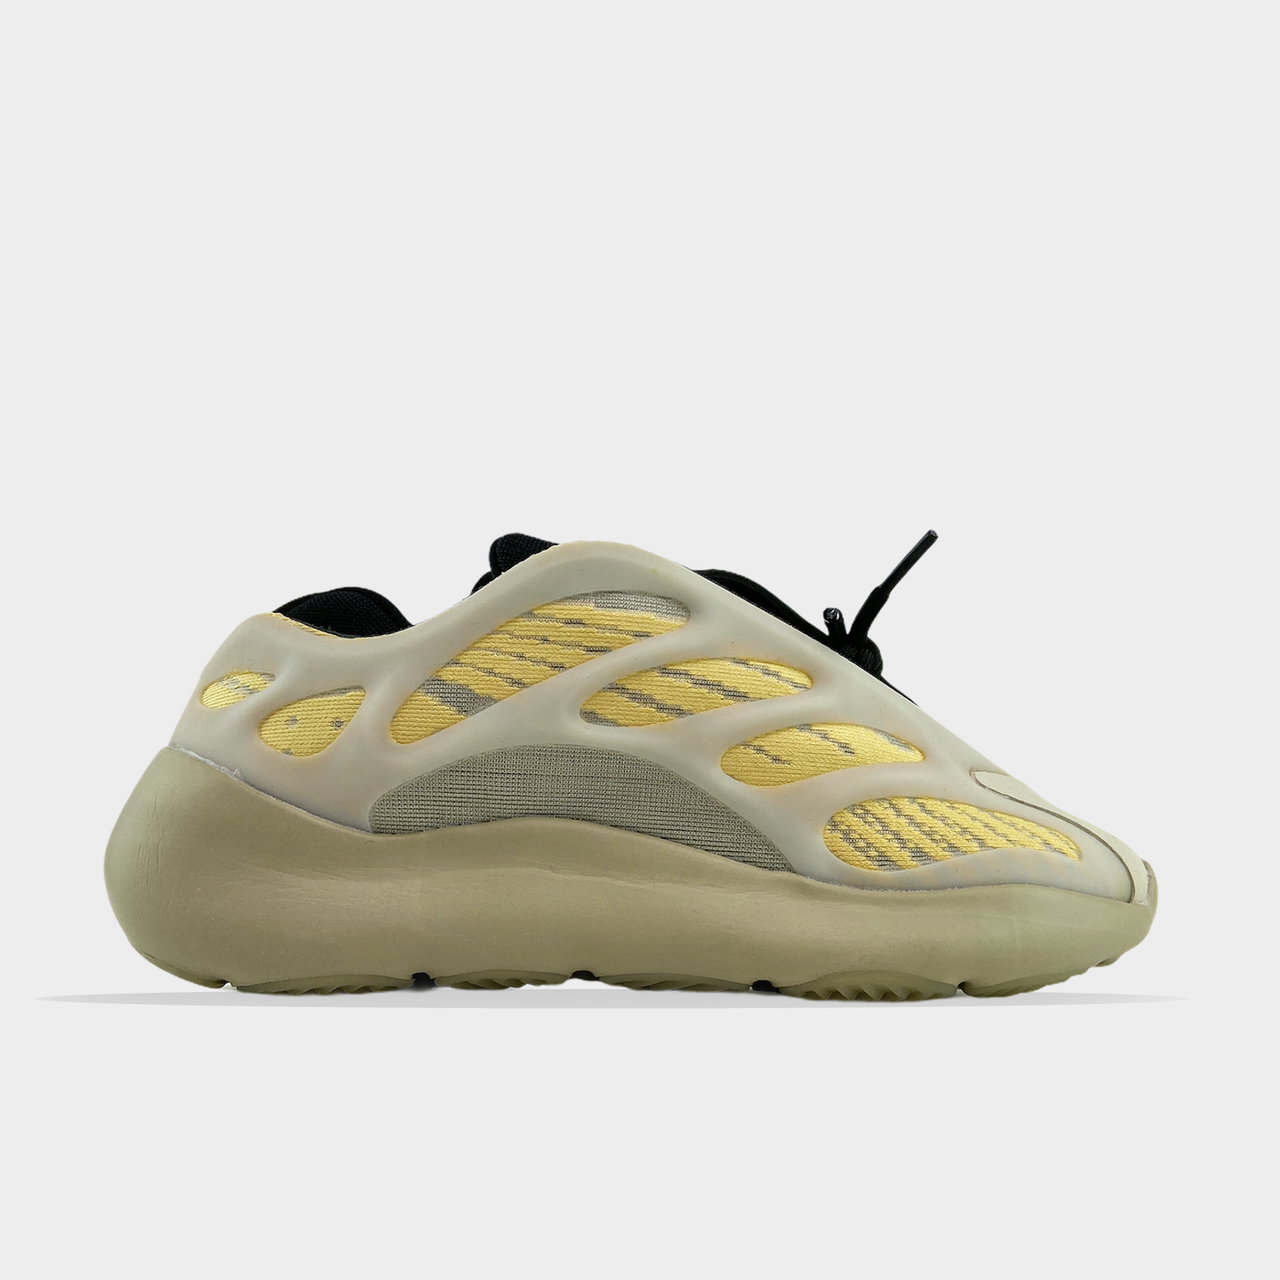 "Ad!id@s, крос, обувь, взуття, sneakers, шузы, Yeezy Boost 700 V3 ""Azael"" Grey Orange (Бежевый)"